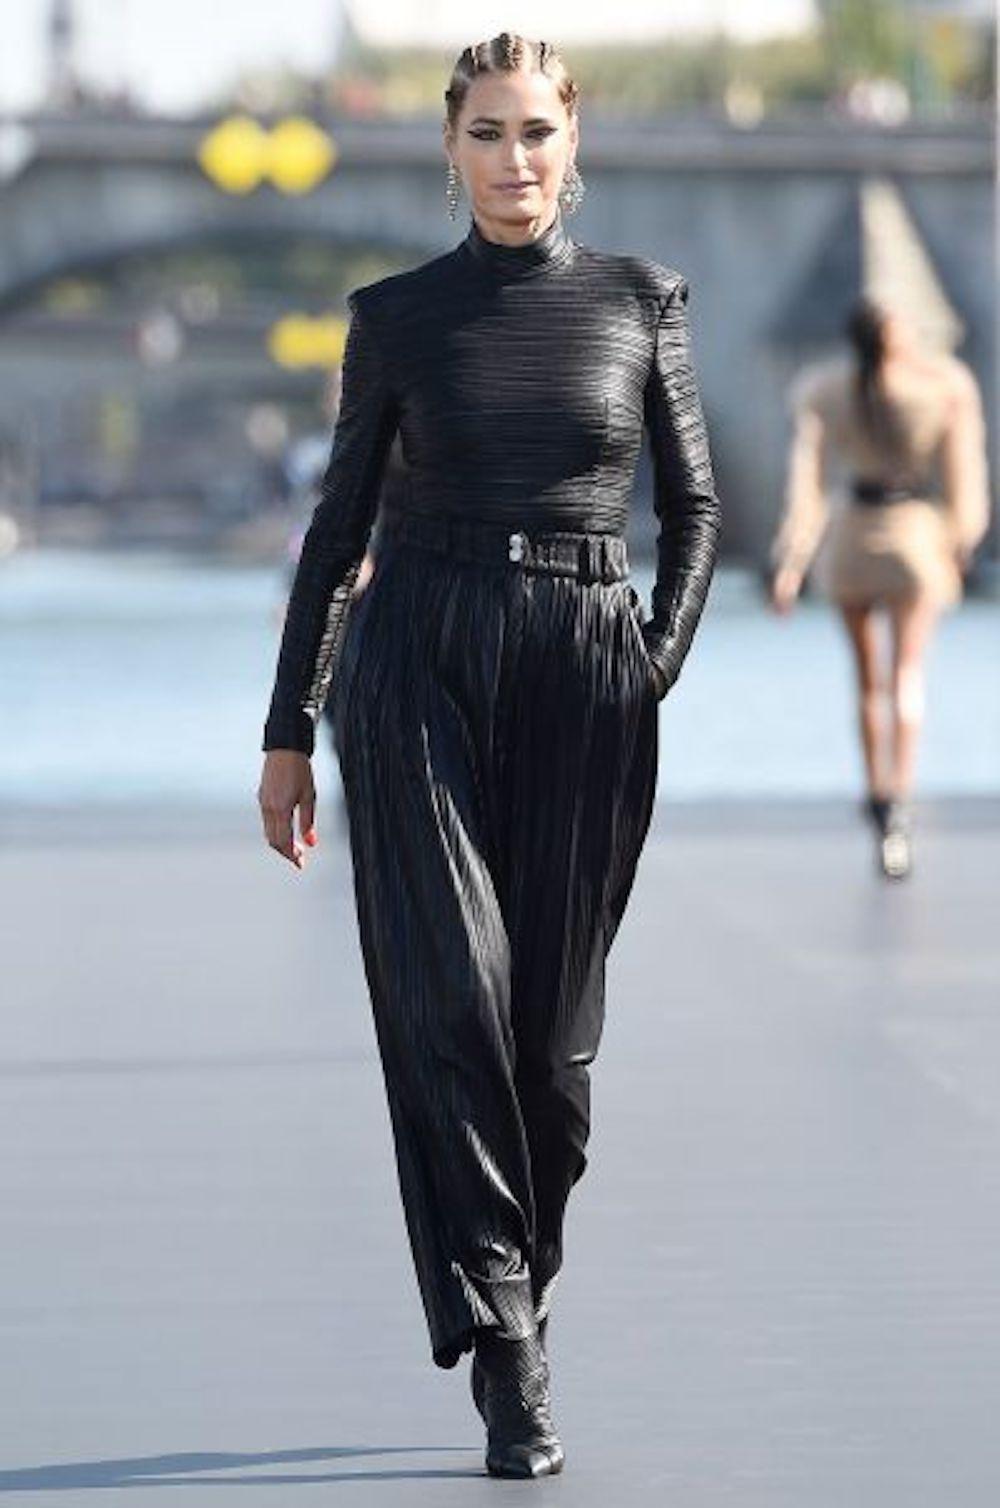 In Balmain for L'Oreal. Paris RTW Fashion Week, 2019.